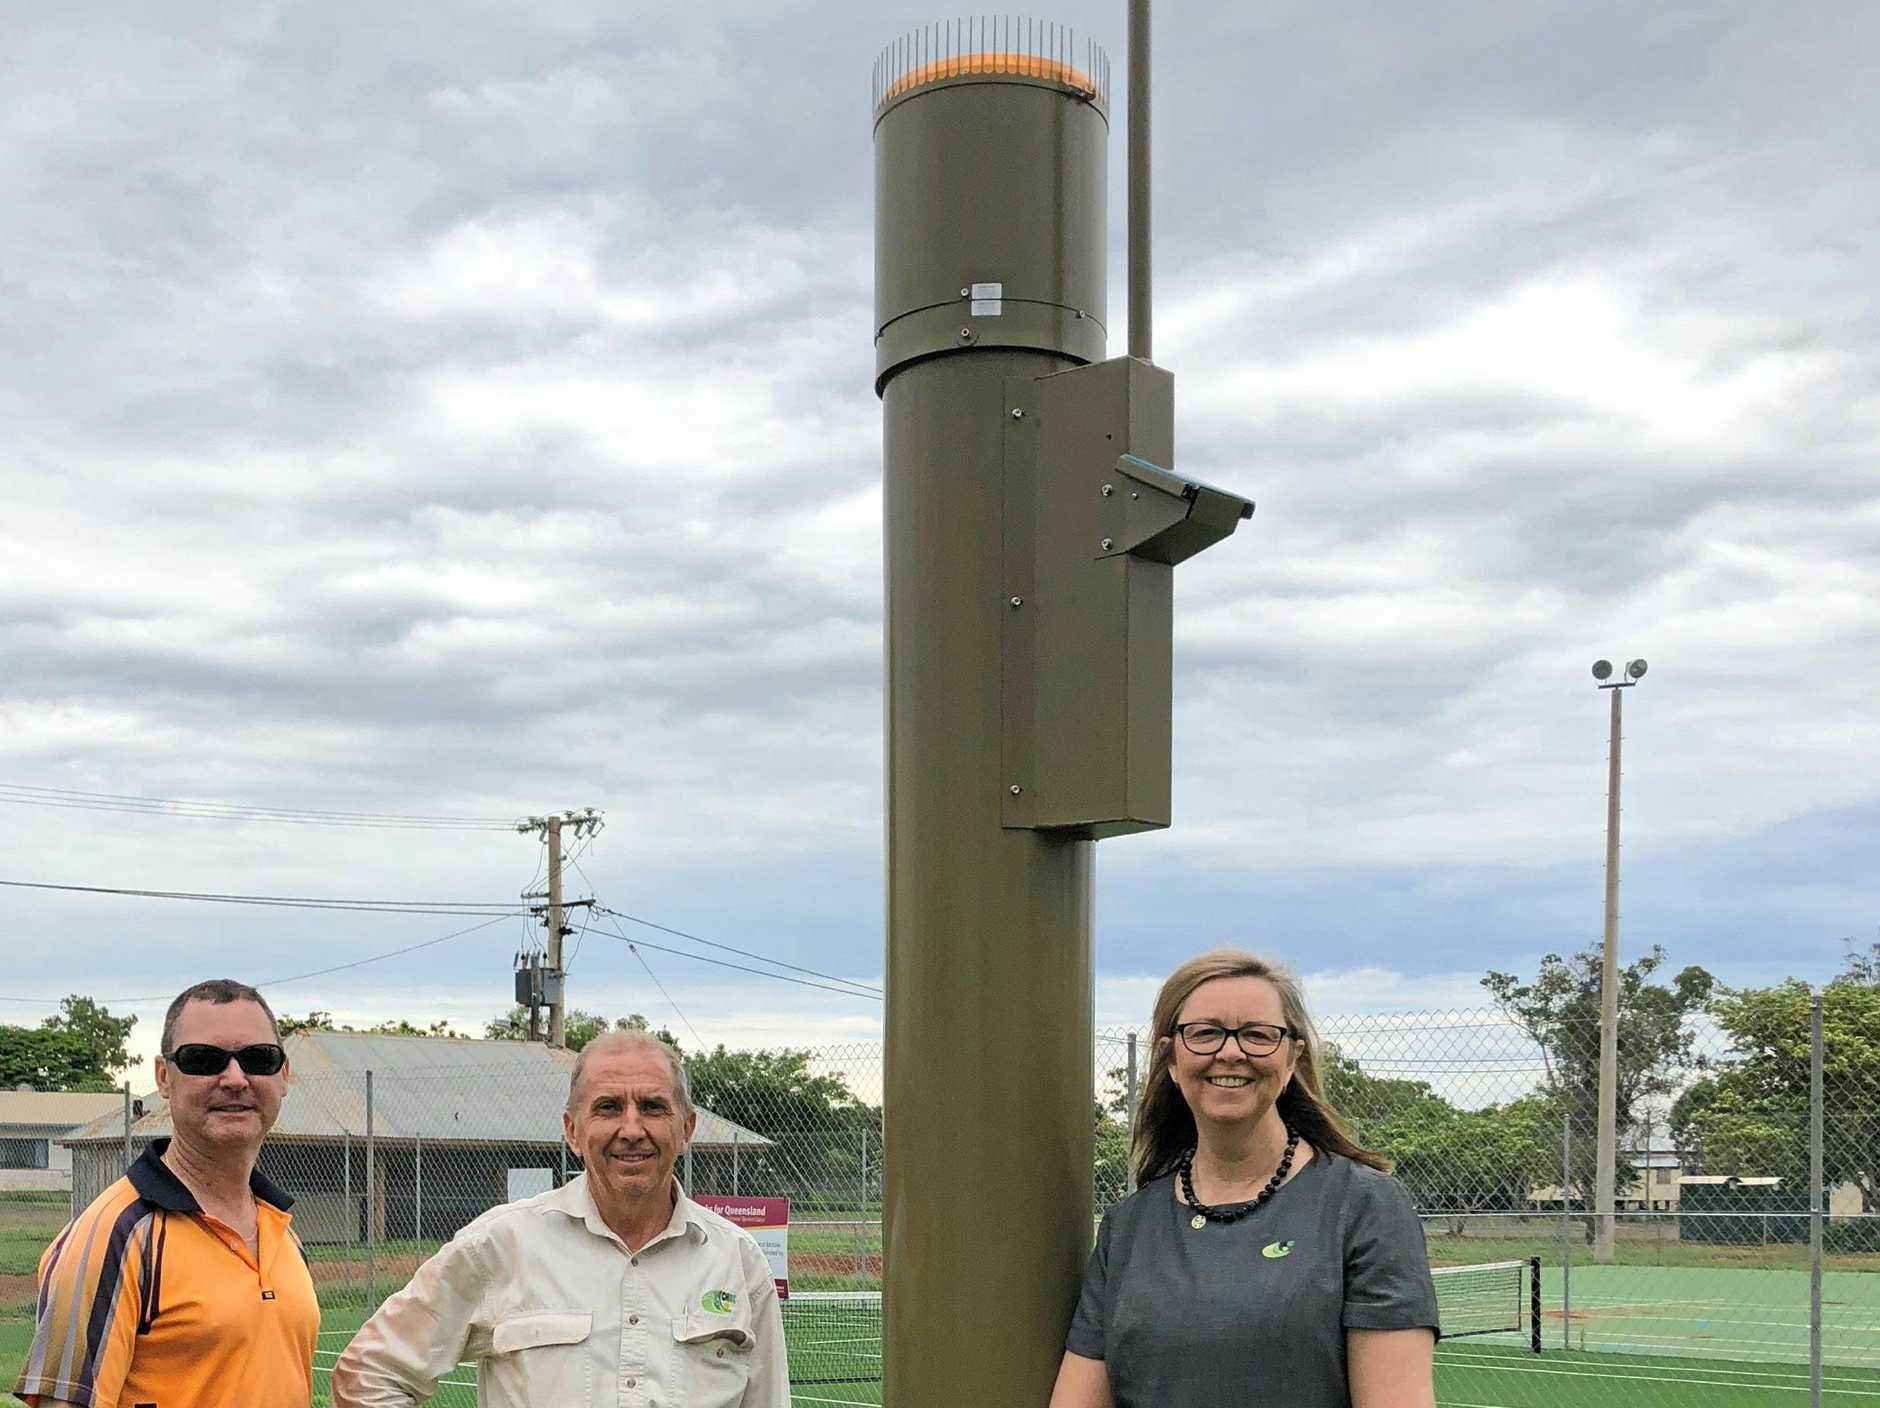 Bureau of Meteorology Field Technician David Woodman, Senior Project Officer Keith Jarrett andDuaringa Area Support Officer Lorrae Brimblecombe at the new Duaringa rain gauge.